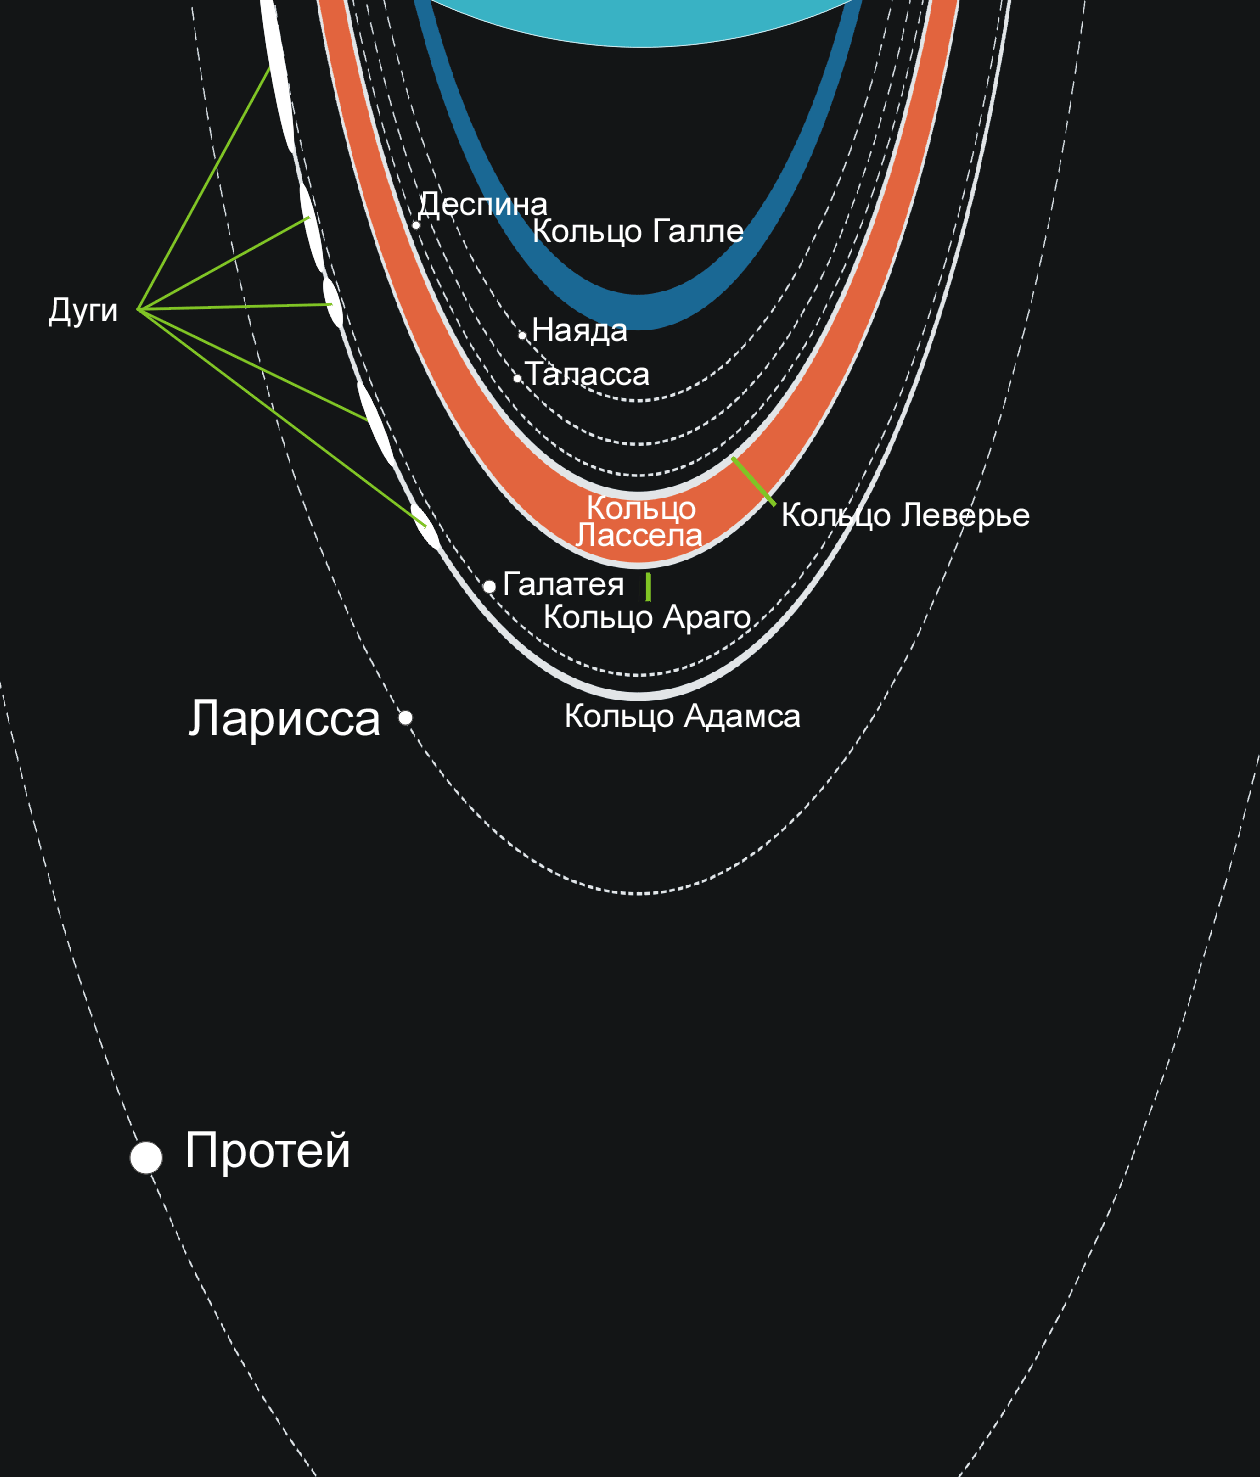 Схема спутников и колец Нептуна